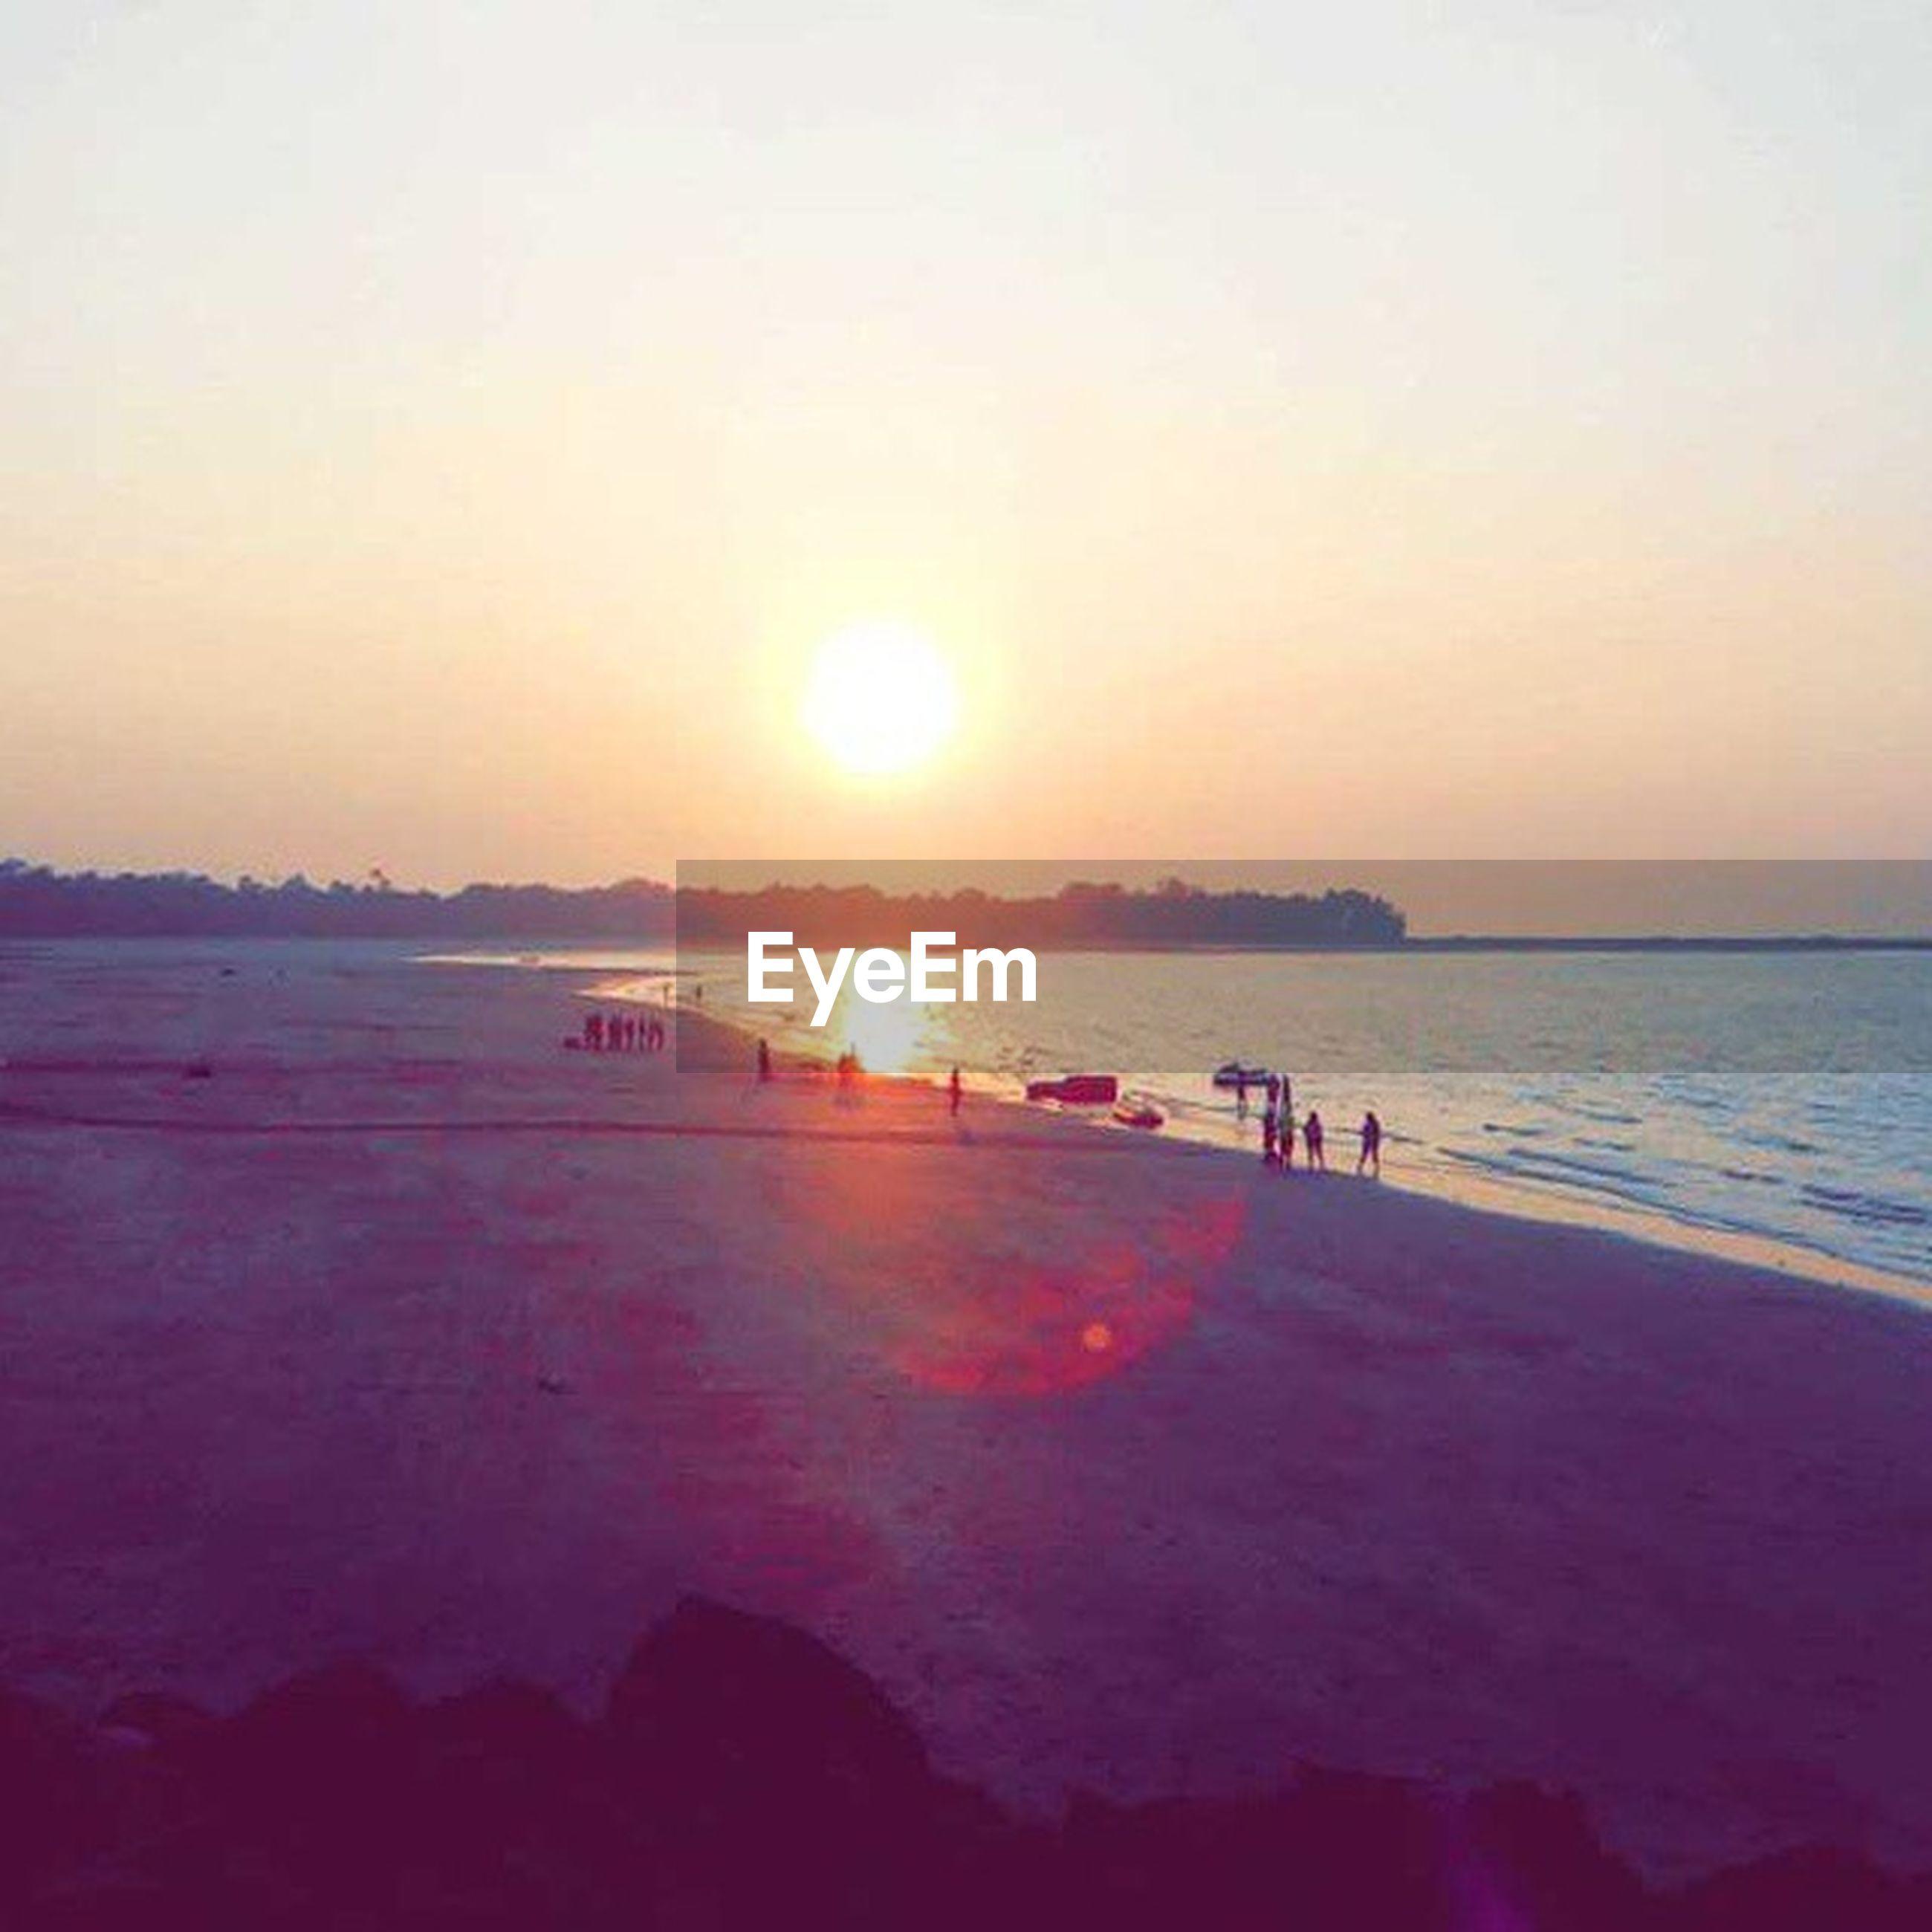 sunset, sun, water, sea, scenics, tranquil scene, beauty in nature, beach, orange color, tranquility, sunlight, nature, idyllic, silhouette, reflection, clear sky, shore, sky, sunbeam, horizon over water